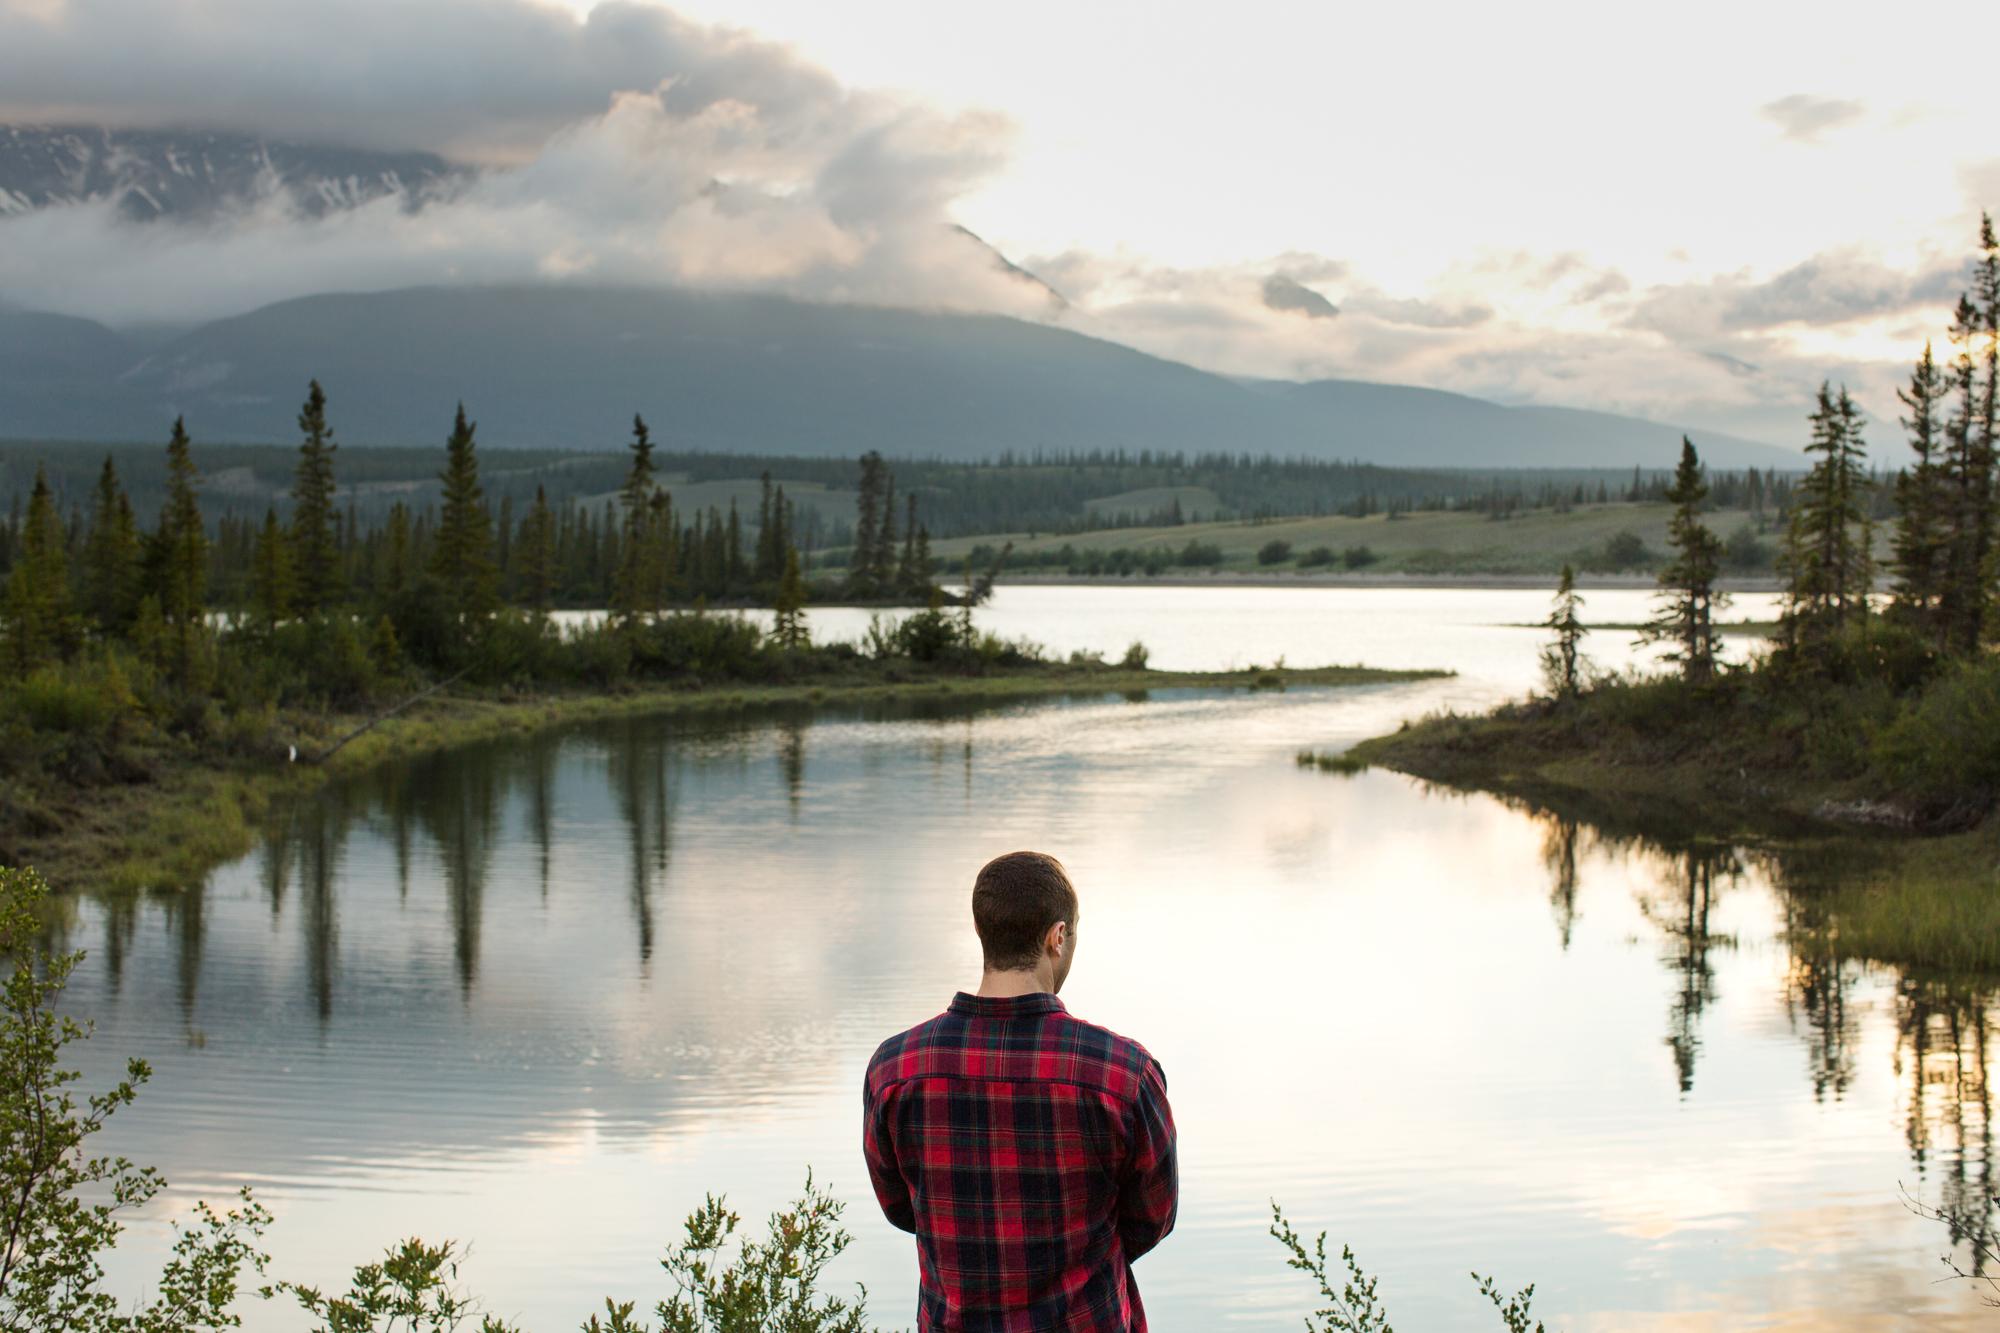 13-Bec_Kilpatrick_Photography_CanadaBEC_20382